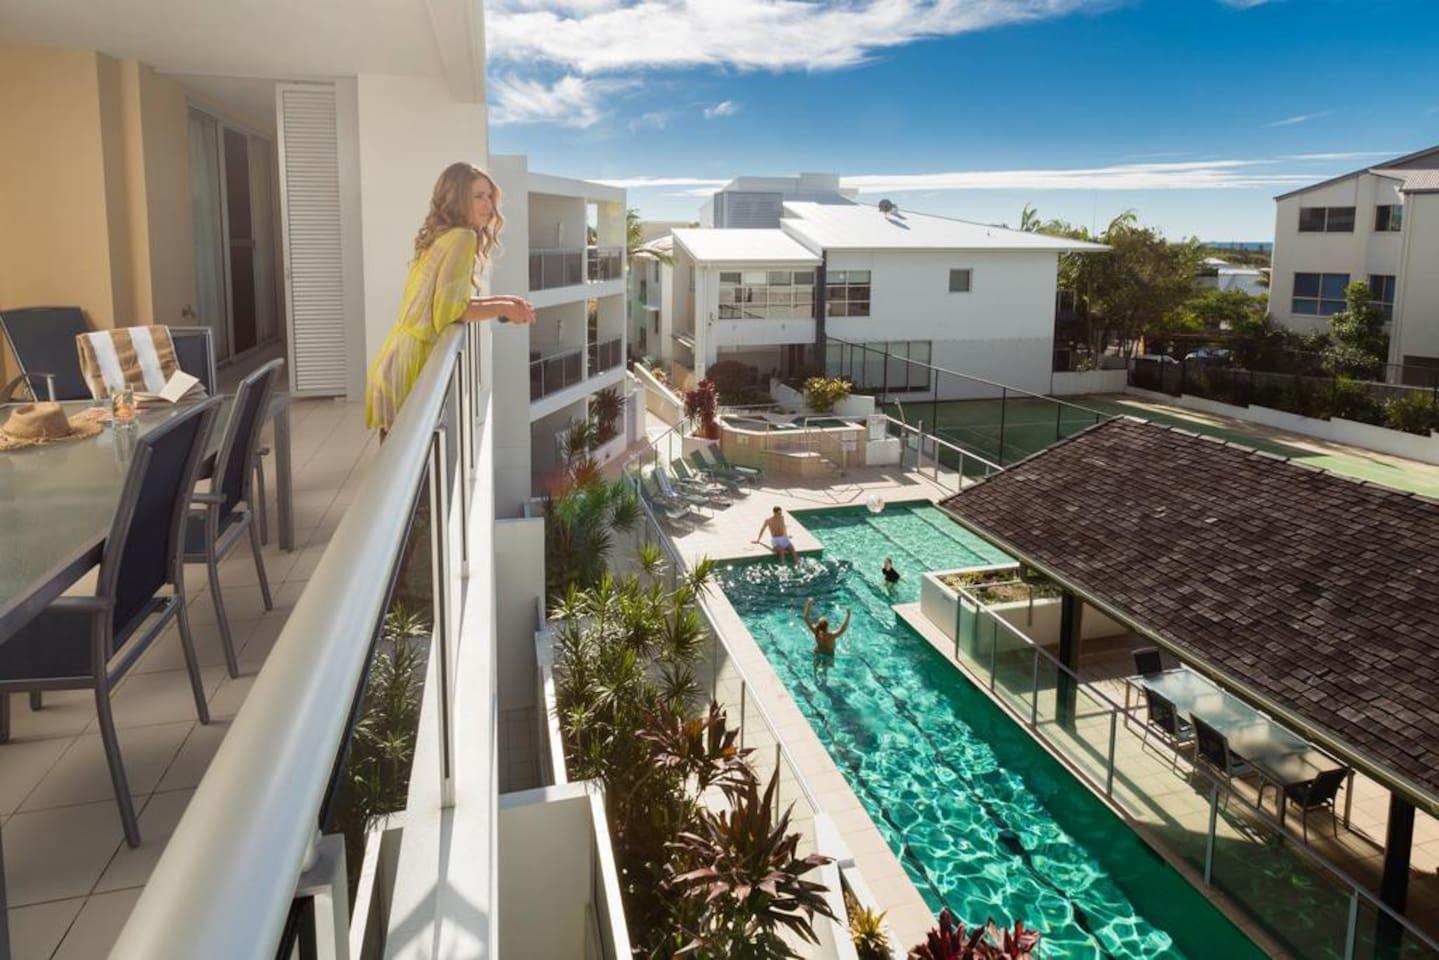 Apartment 2BR Coolum Beach    Rooftop Terrace   Spa   Tennis   Pool photo 26289867